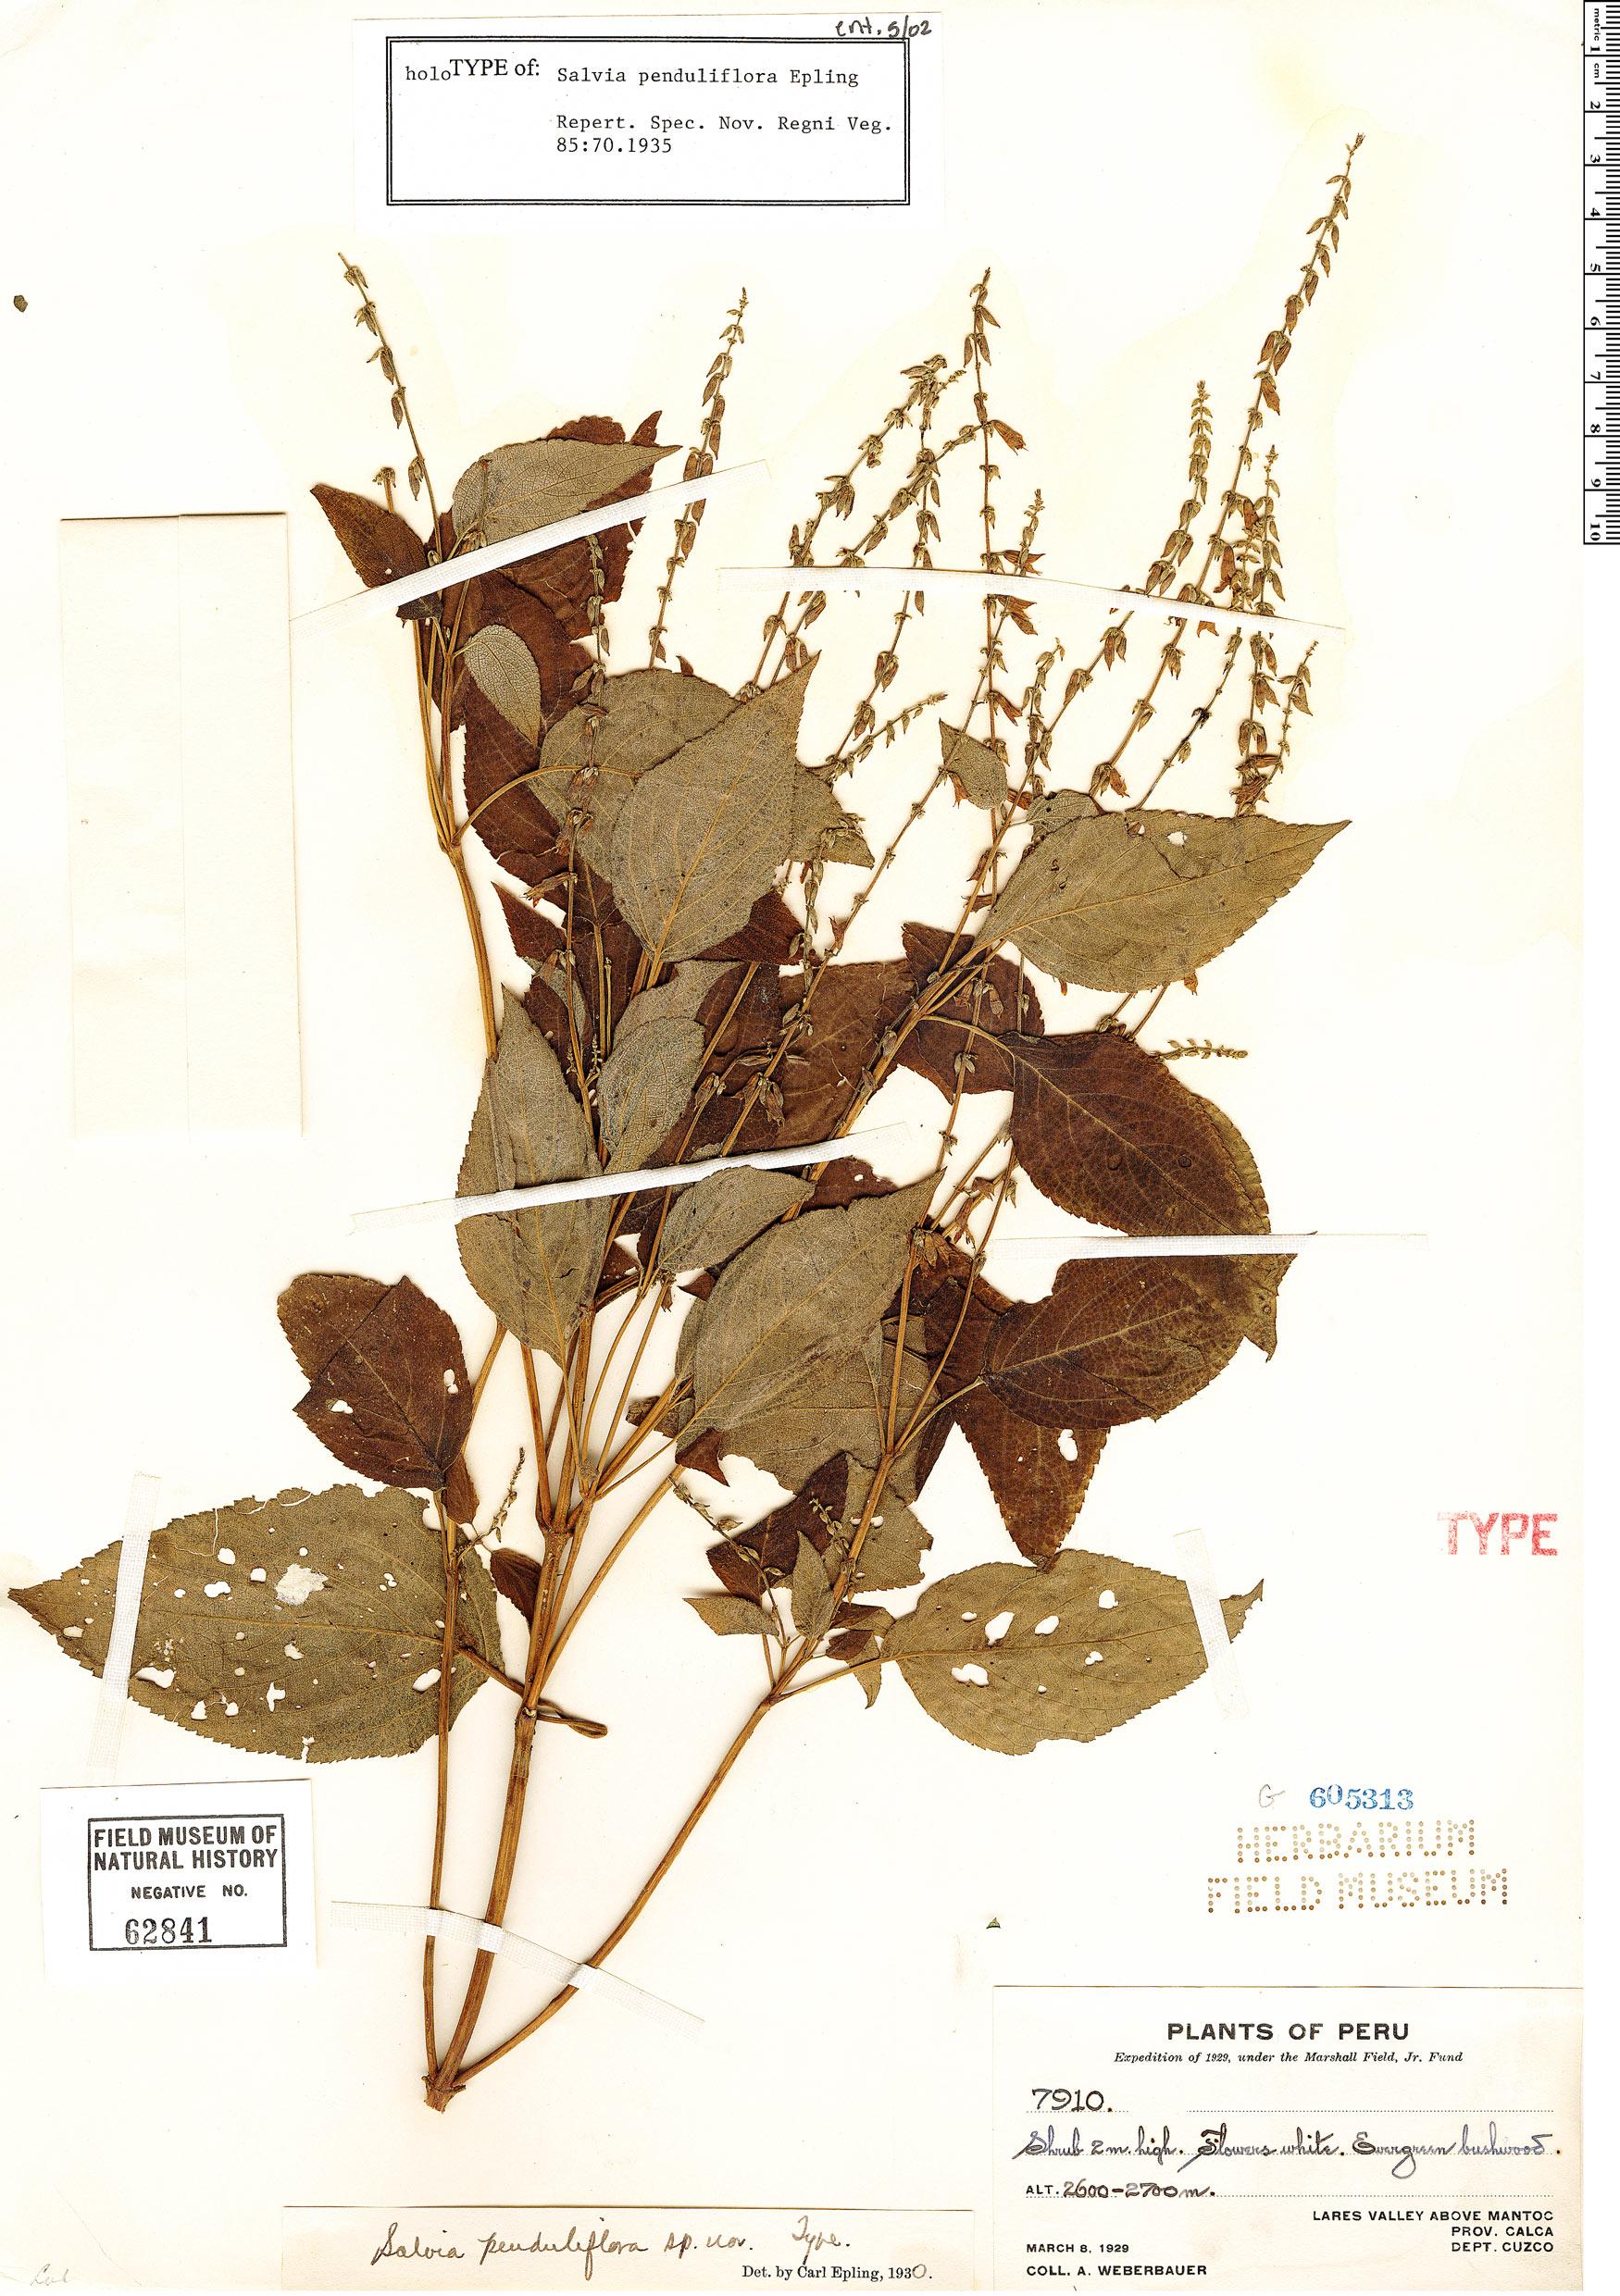 Specimen: Salvia penduliflora